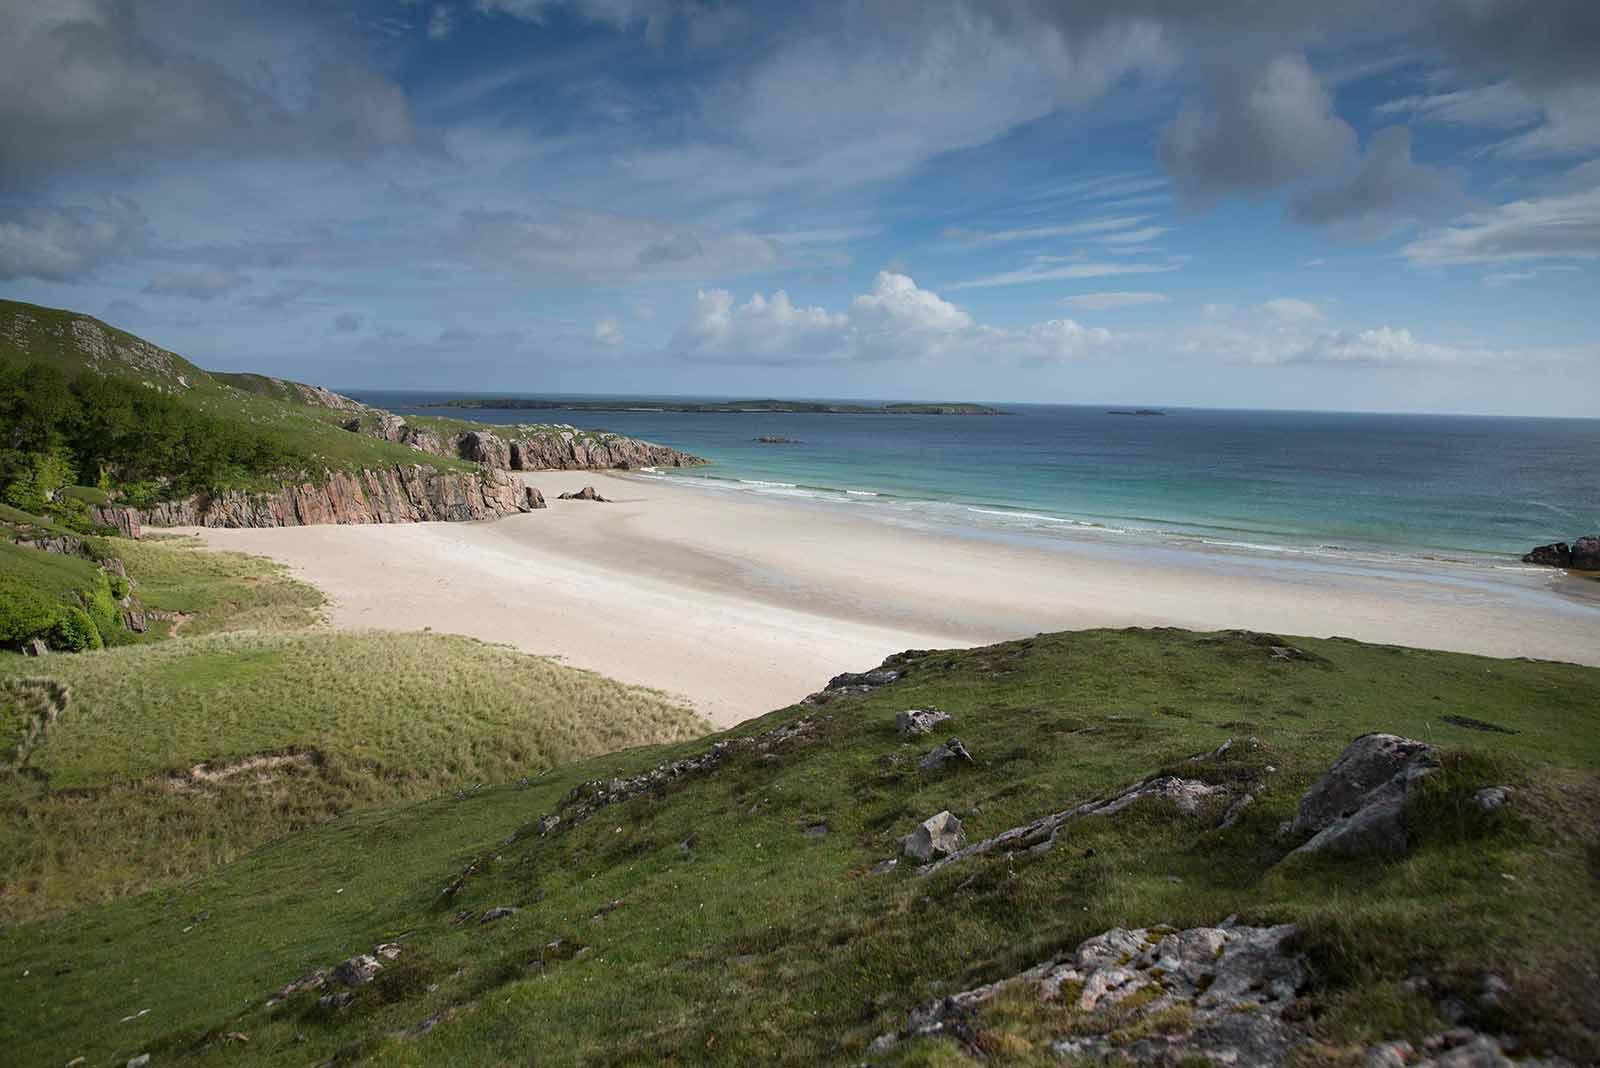 North Coast 500, Highland Beach, Caithness, Scotland the best, trout fishing, Balnakeil beach